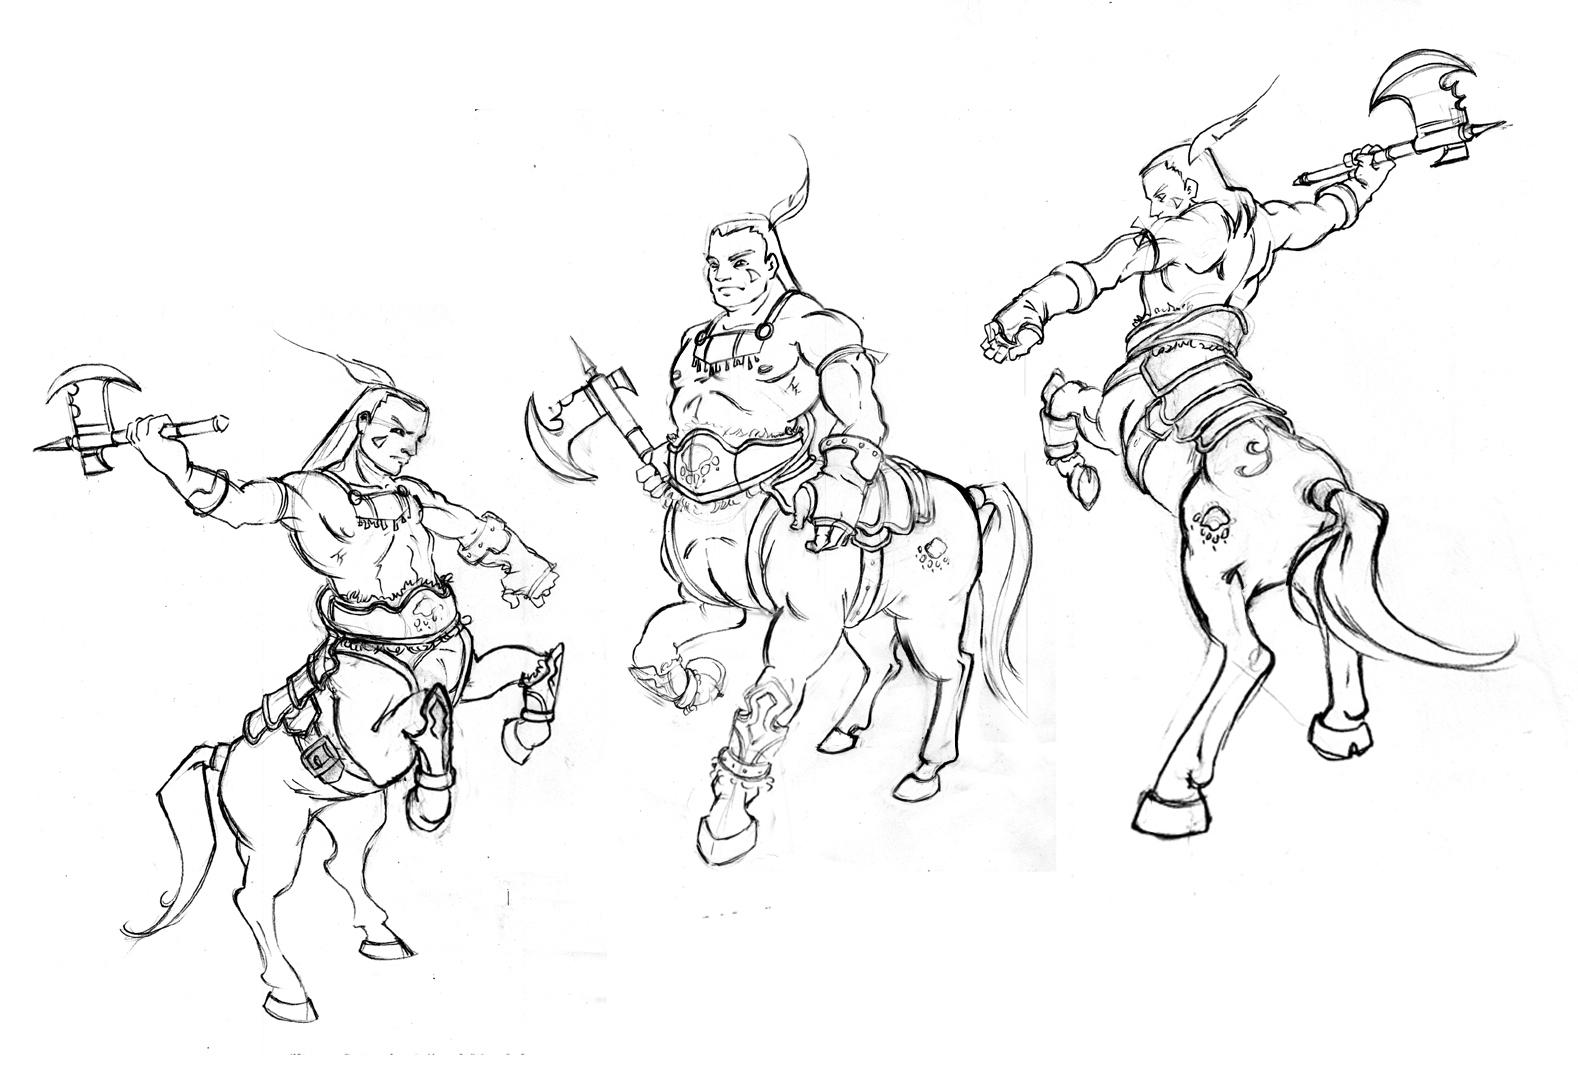 Tiffanny's Sketchbook: Mythological Characters